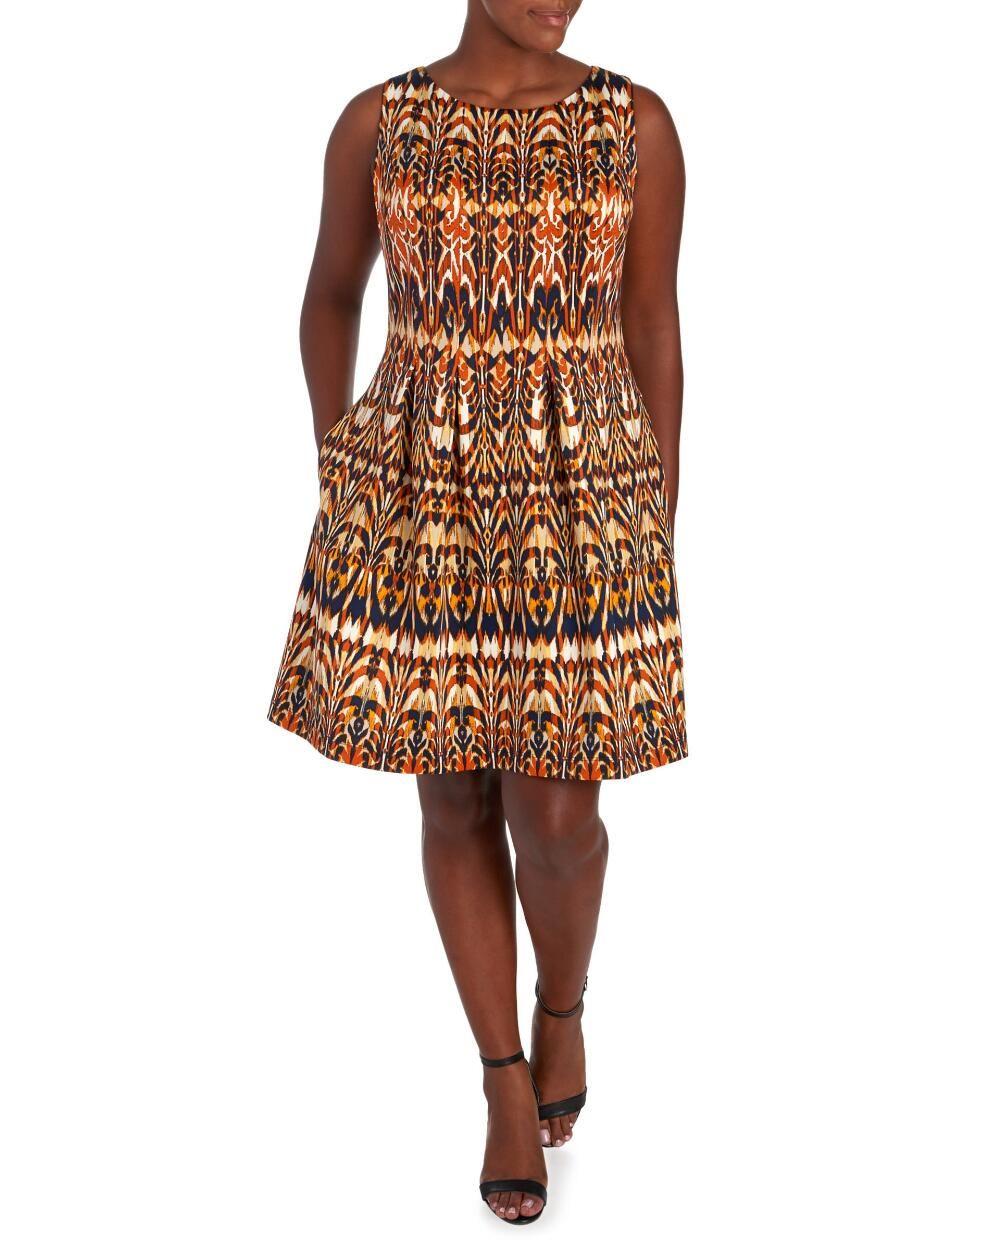 0222fe380542 Women's Plus Size Ikat Print Fit and Flare Dress-Dresses-Plus Size-Women | Stein  Mart